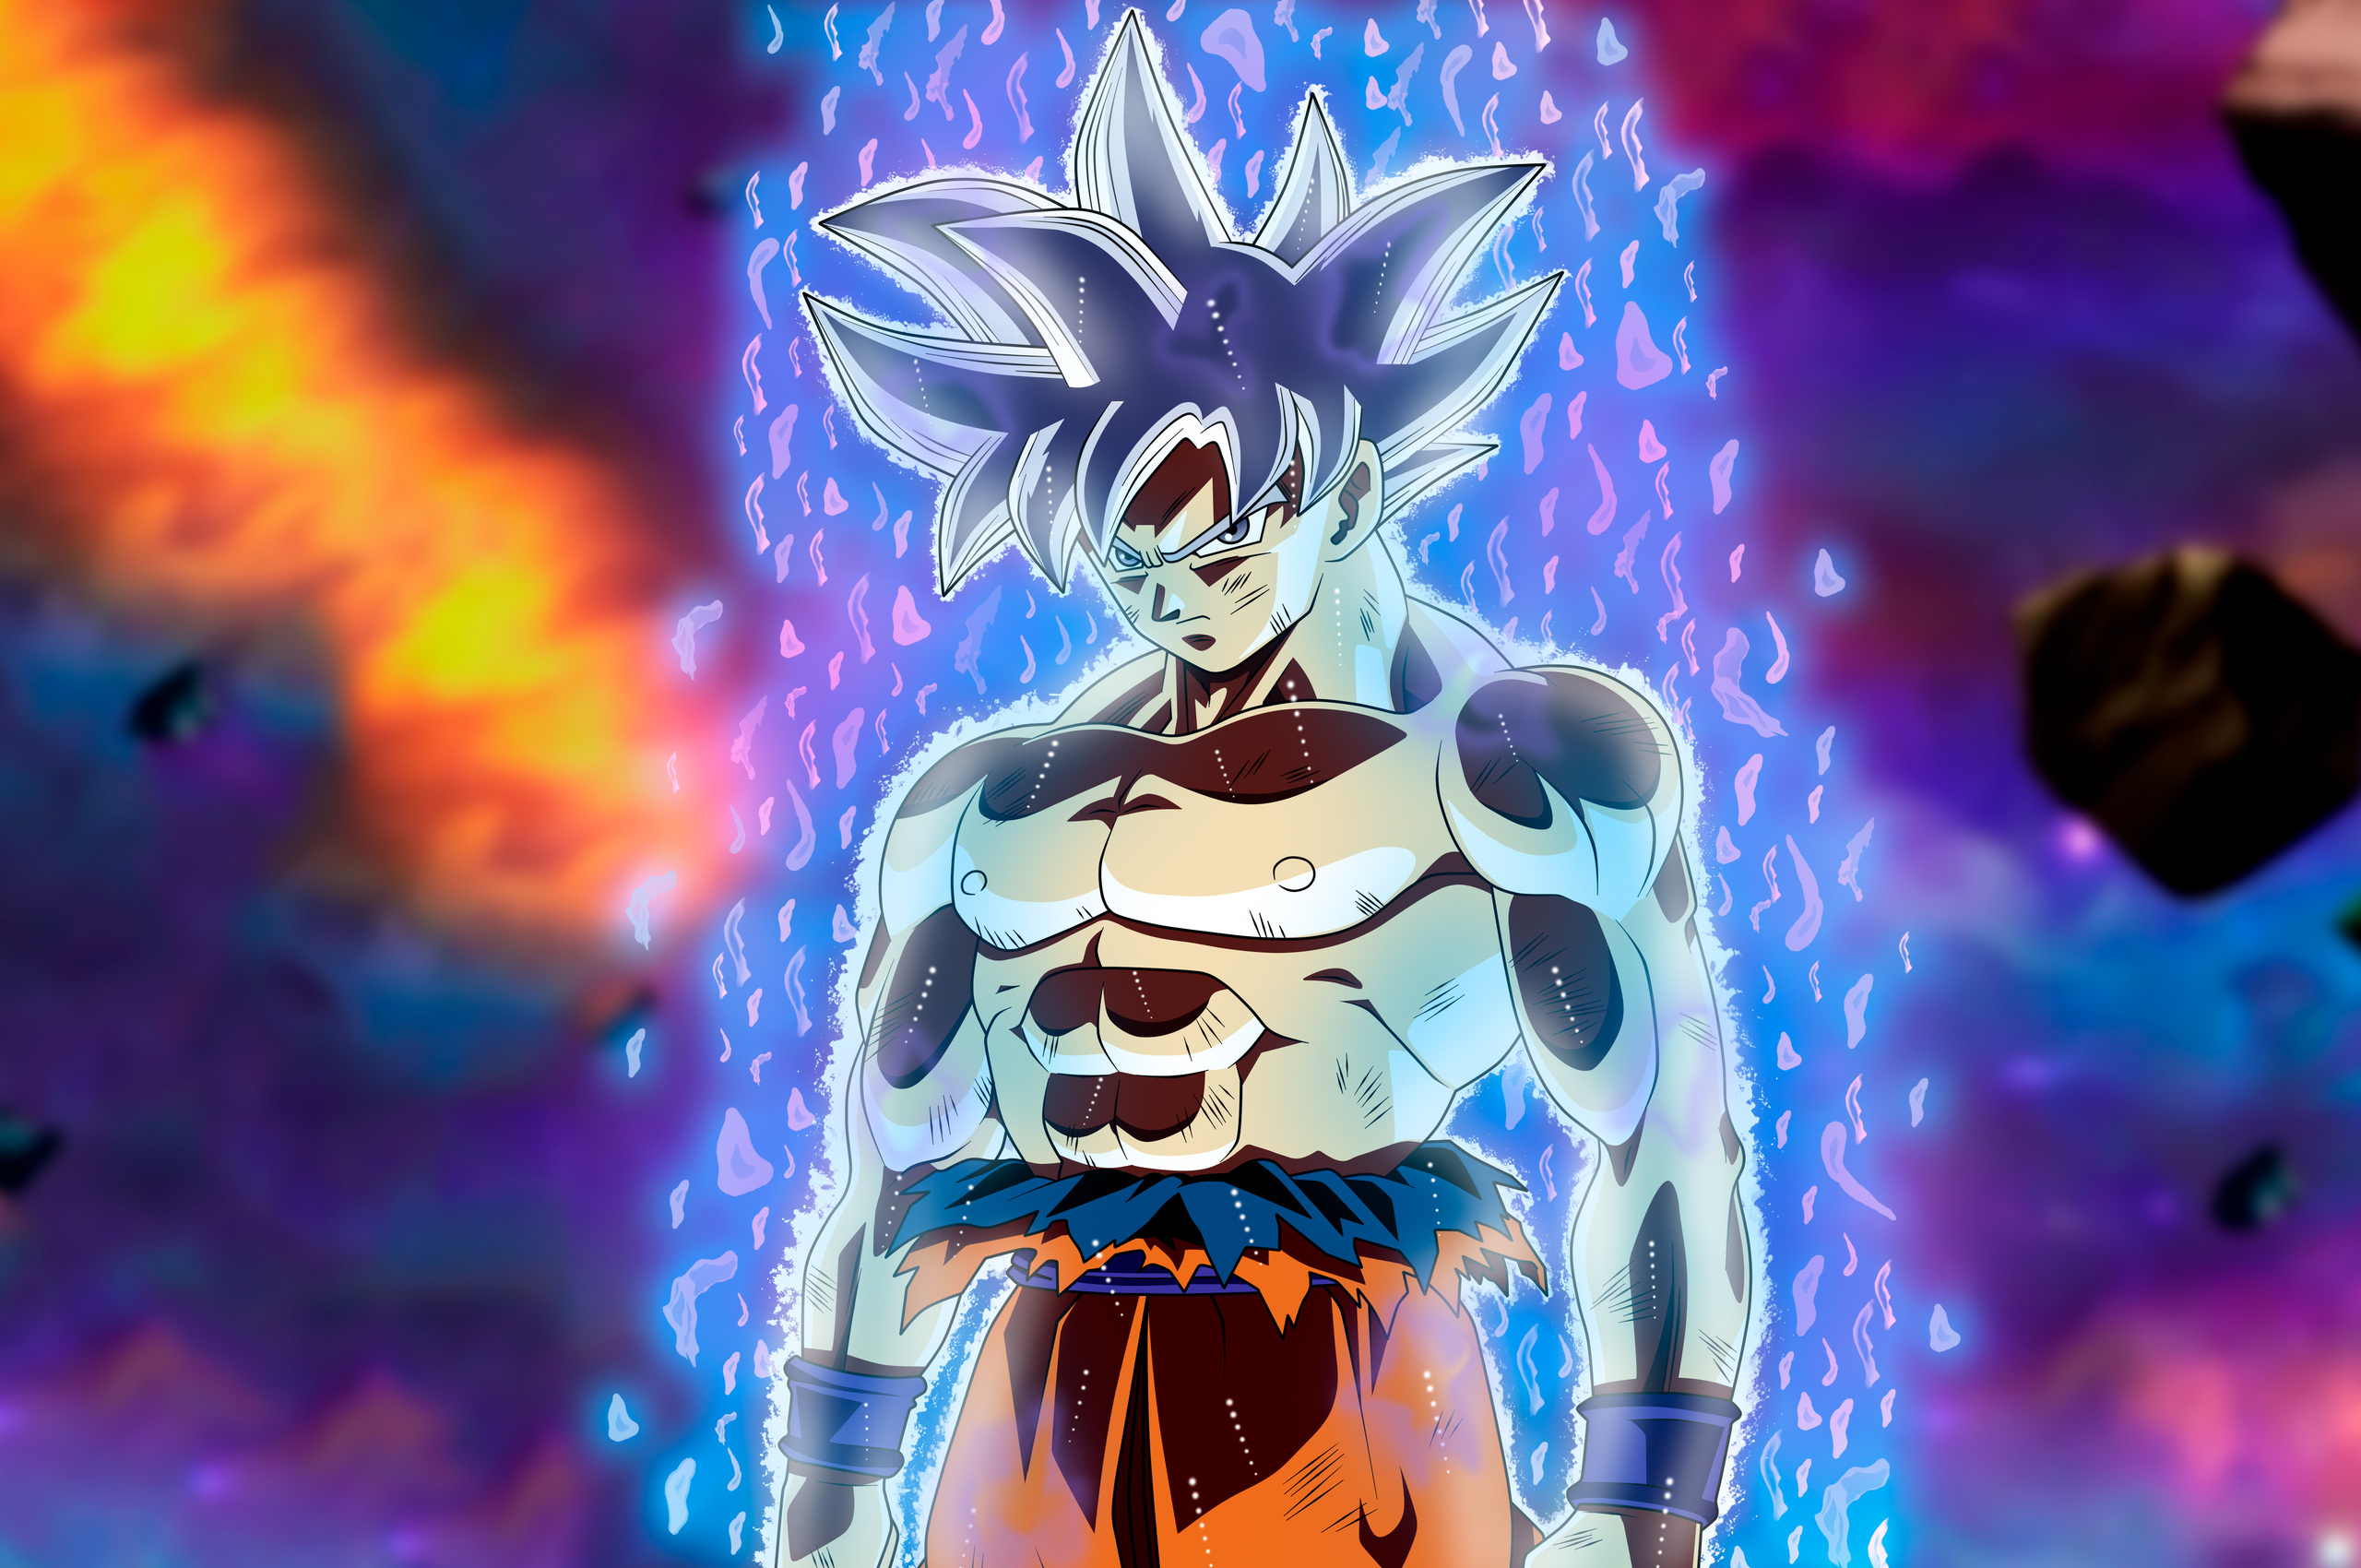 Goku Ultra Instinct 4k Wallpapers: 2560x1700 Goku Migatte No Gokui Perfecto Ultra Instinct